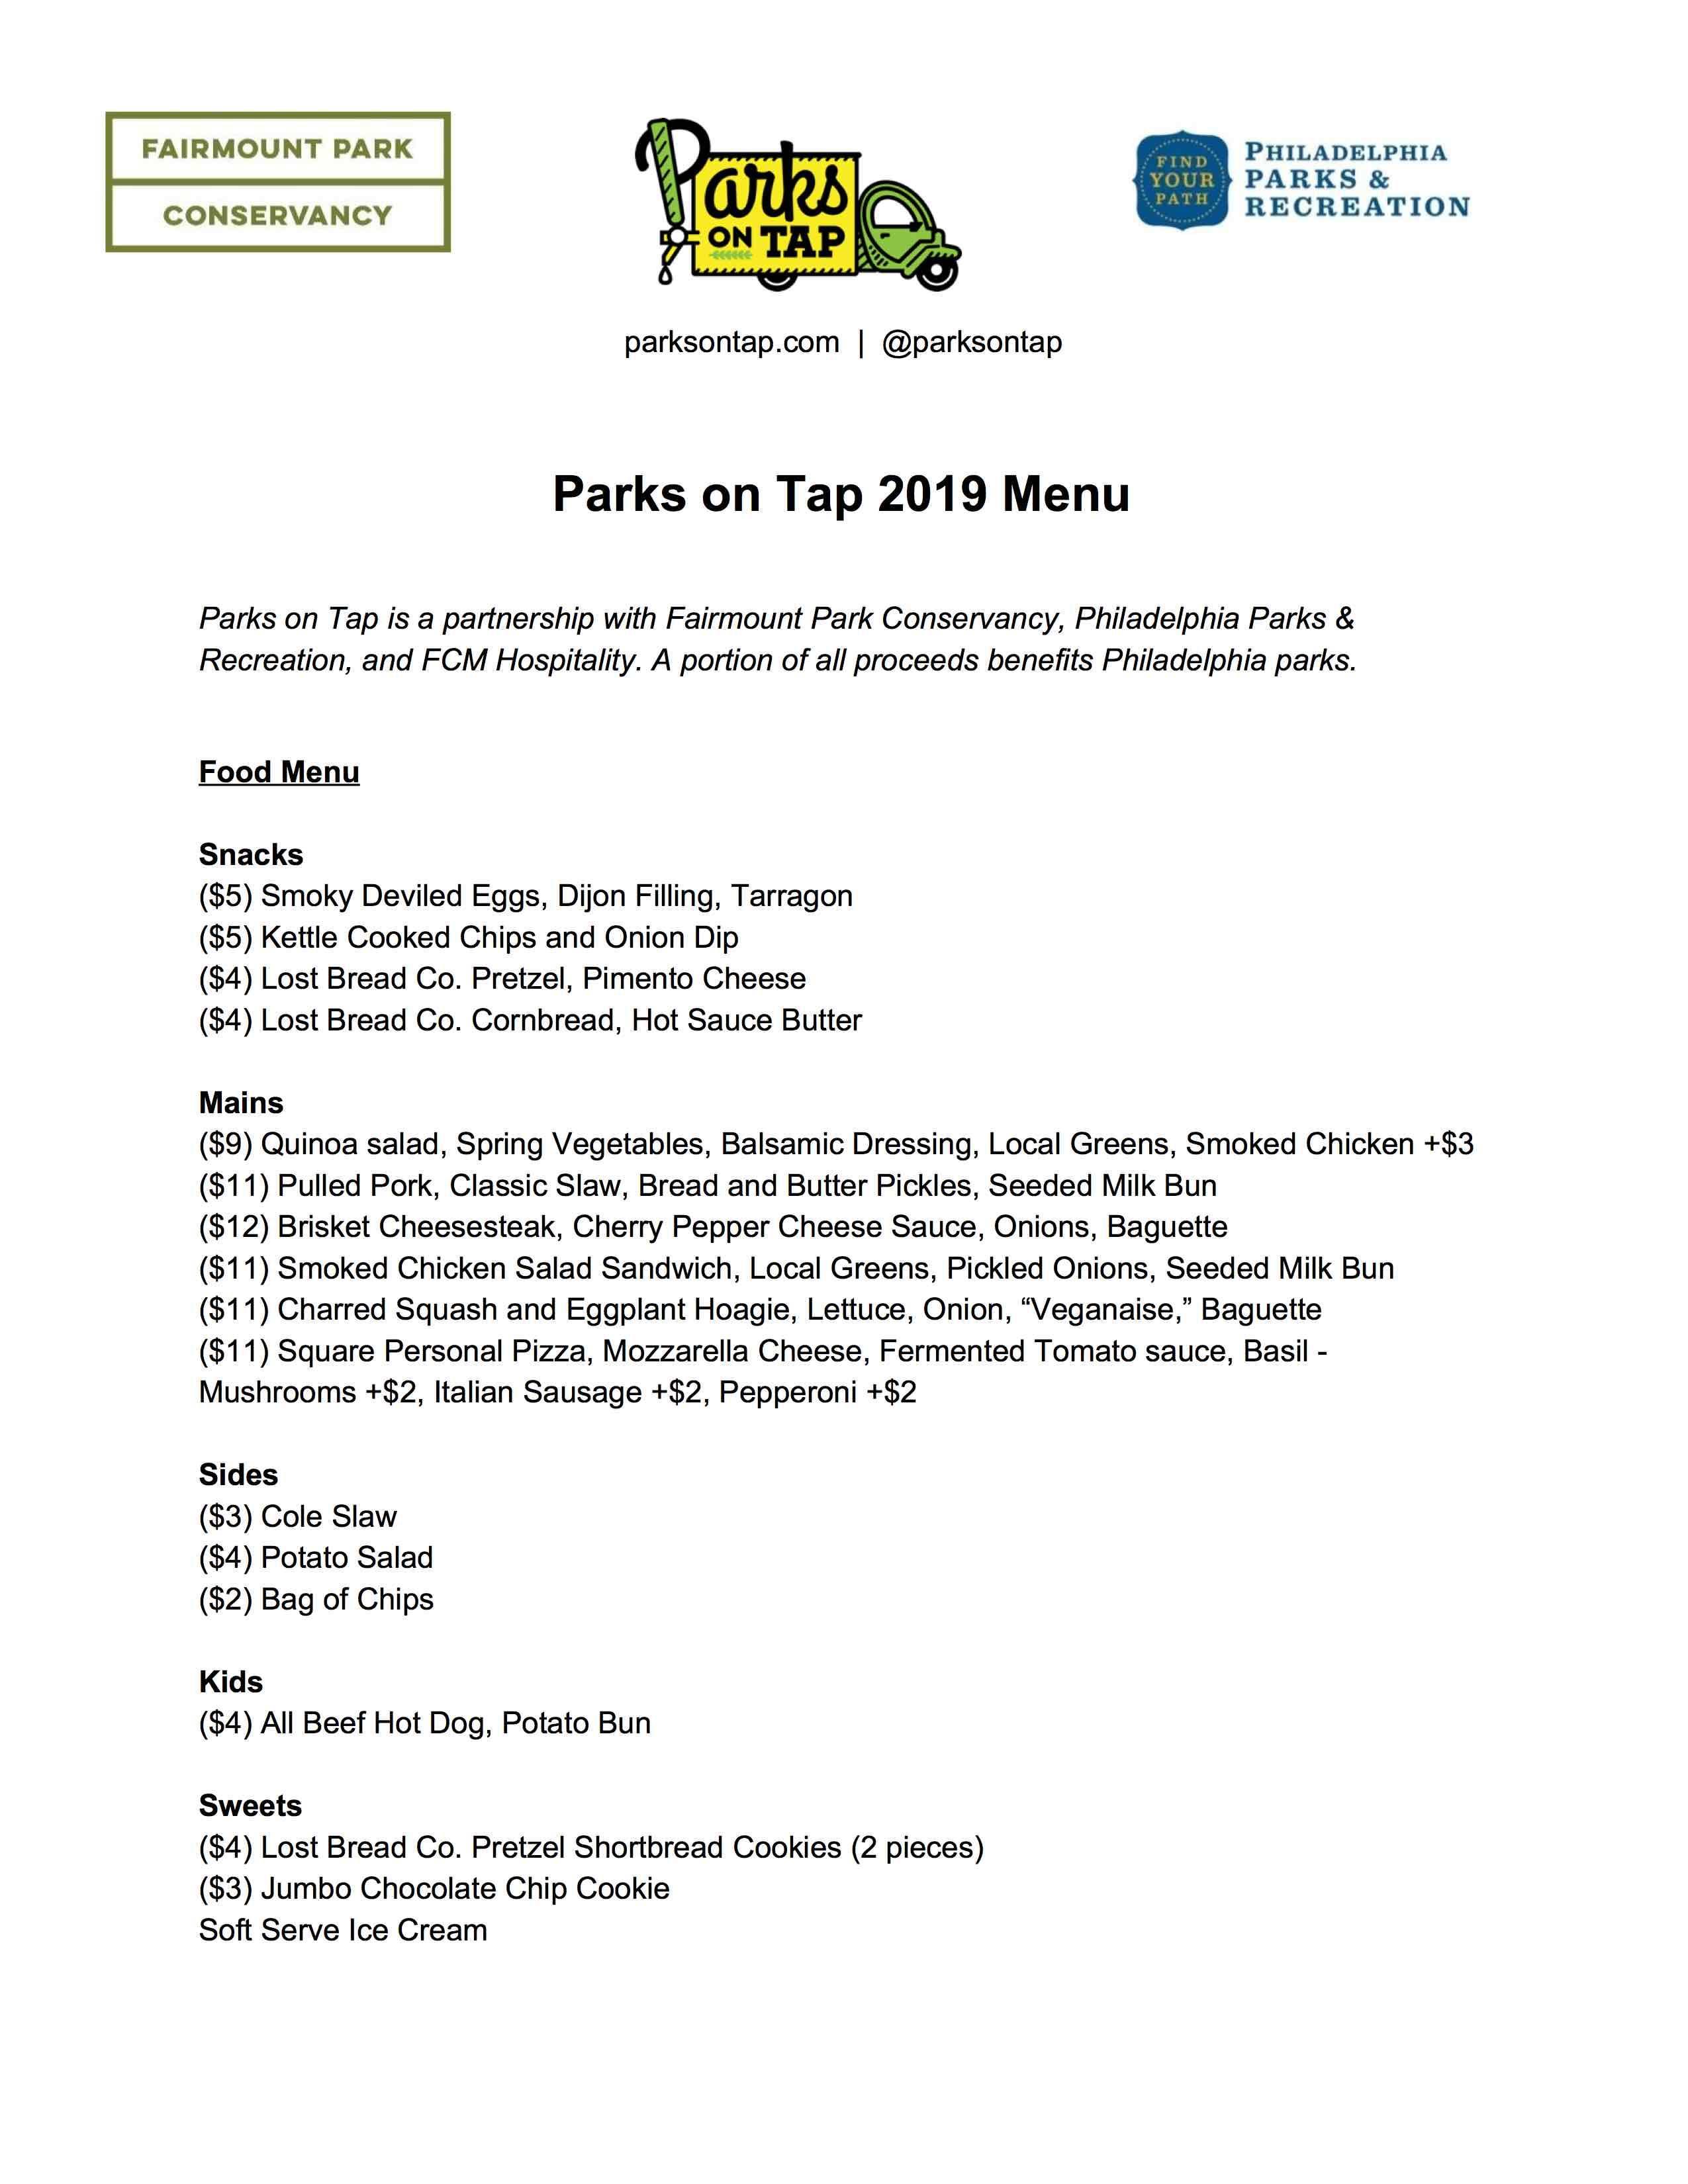 parks on tap menu philadelphia